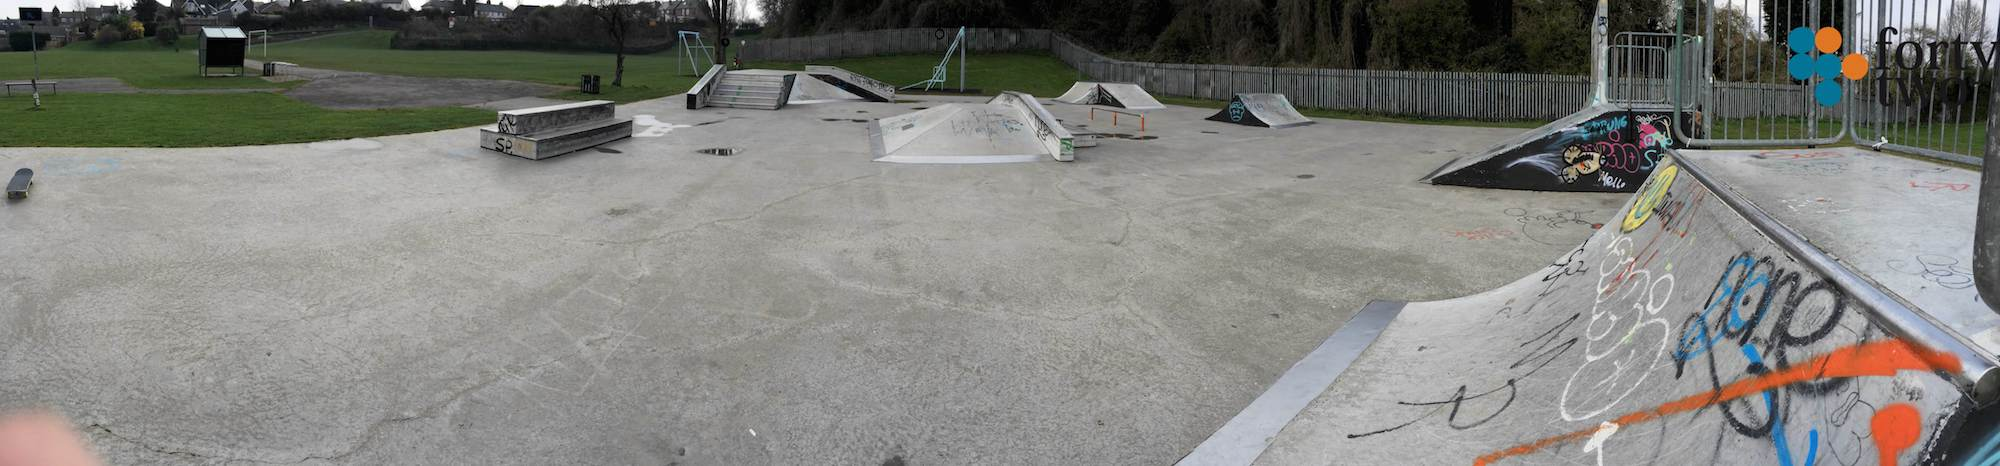 Standhill Skatepark Nottingham Panarama 2